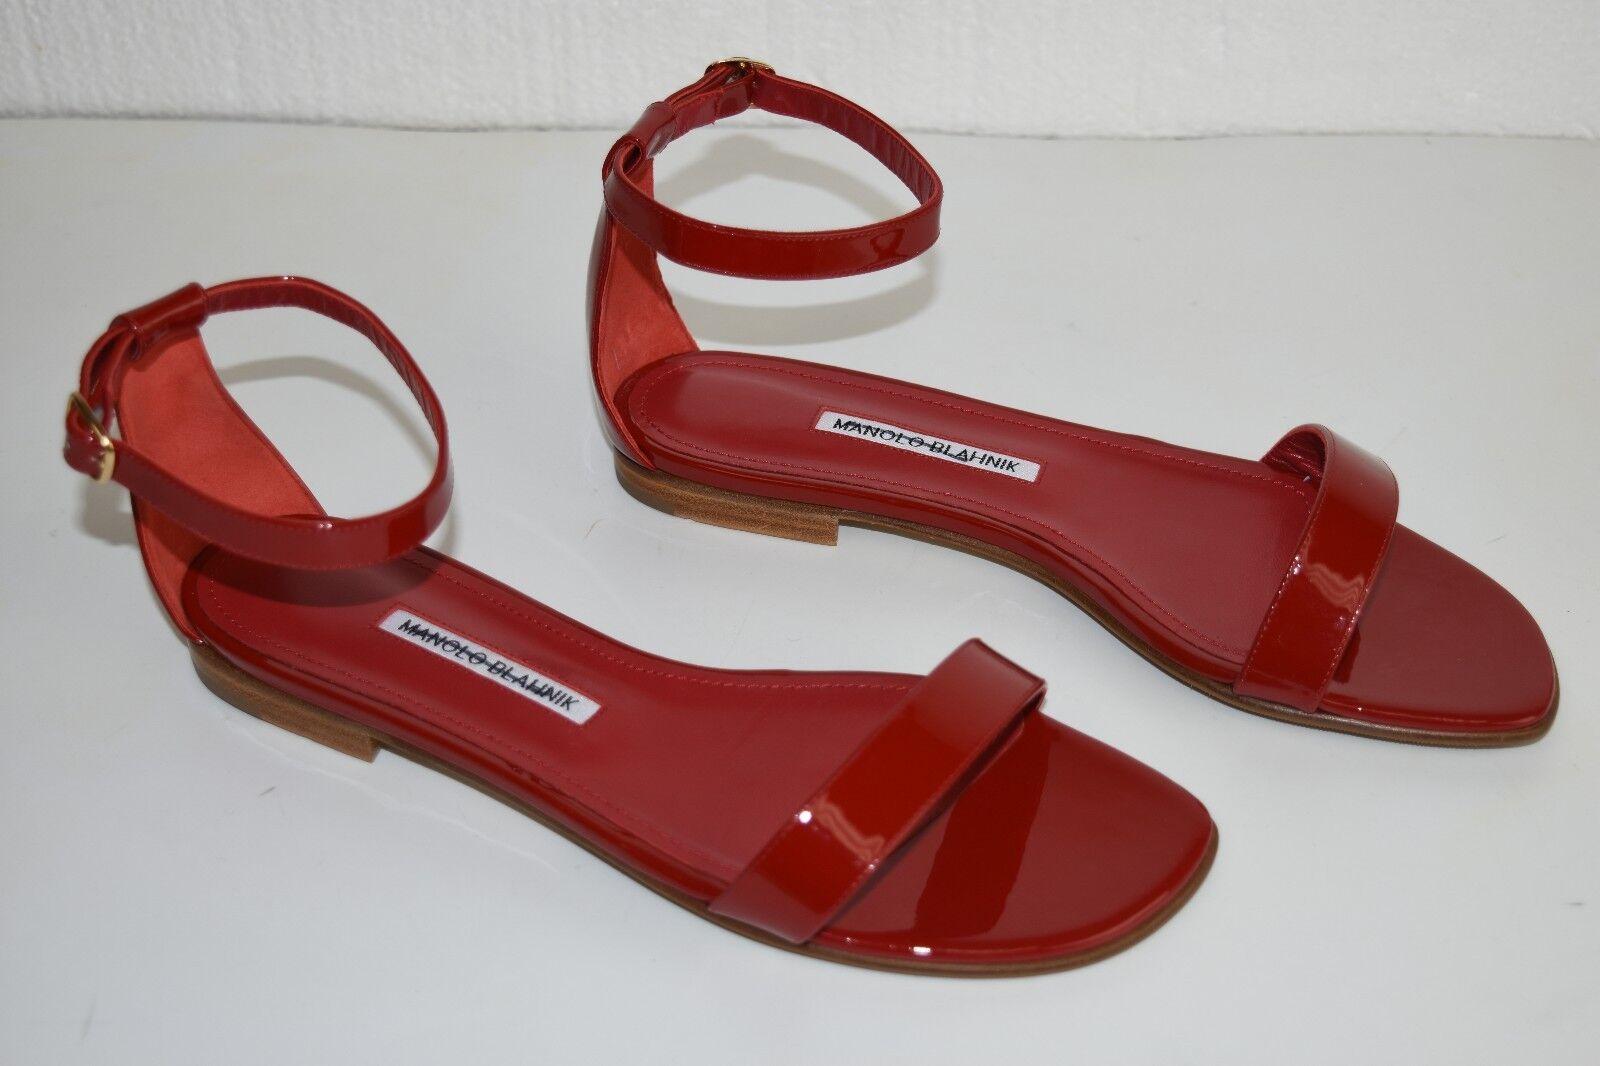 New manolo blahnik flat shiny chafla patent red sandals 40 40.5